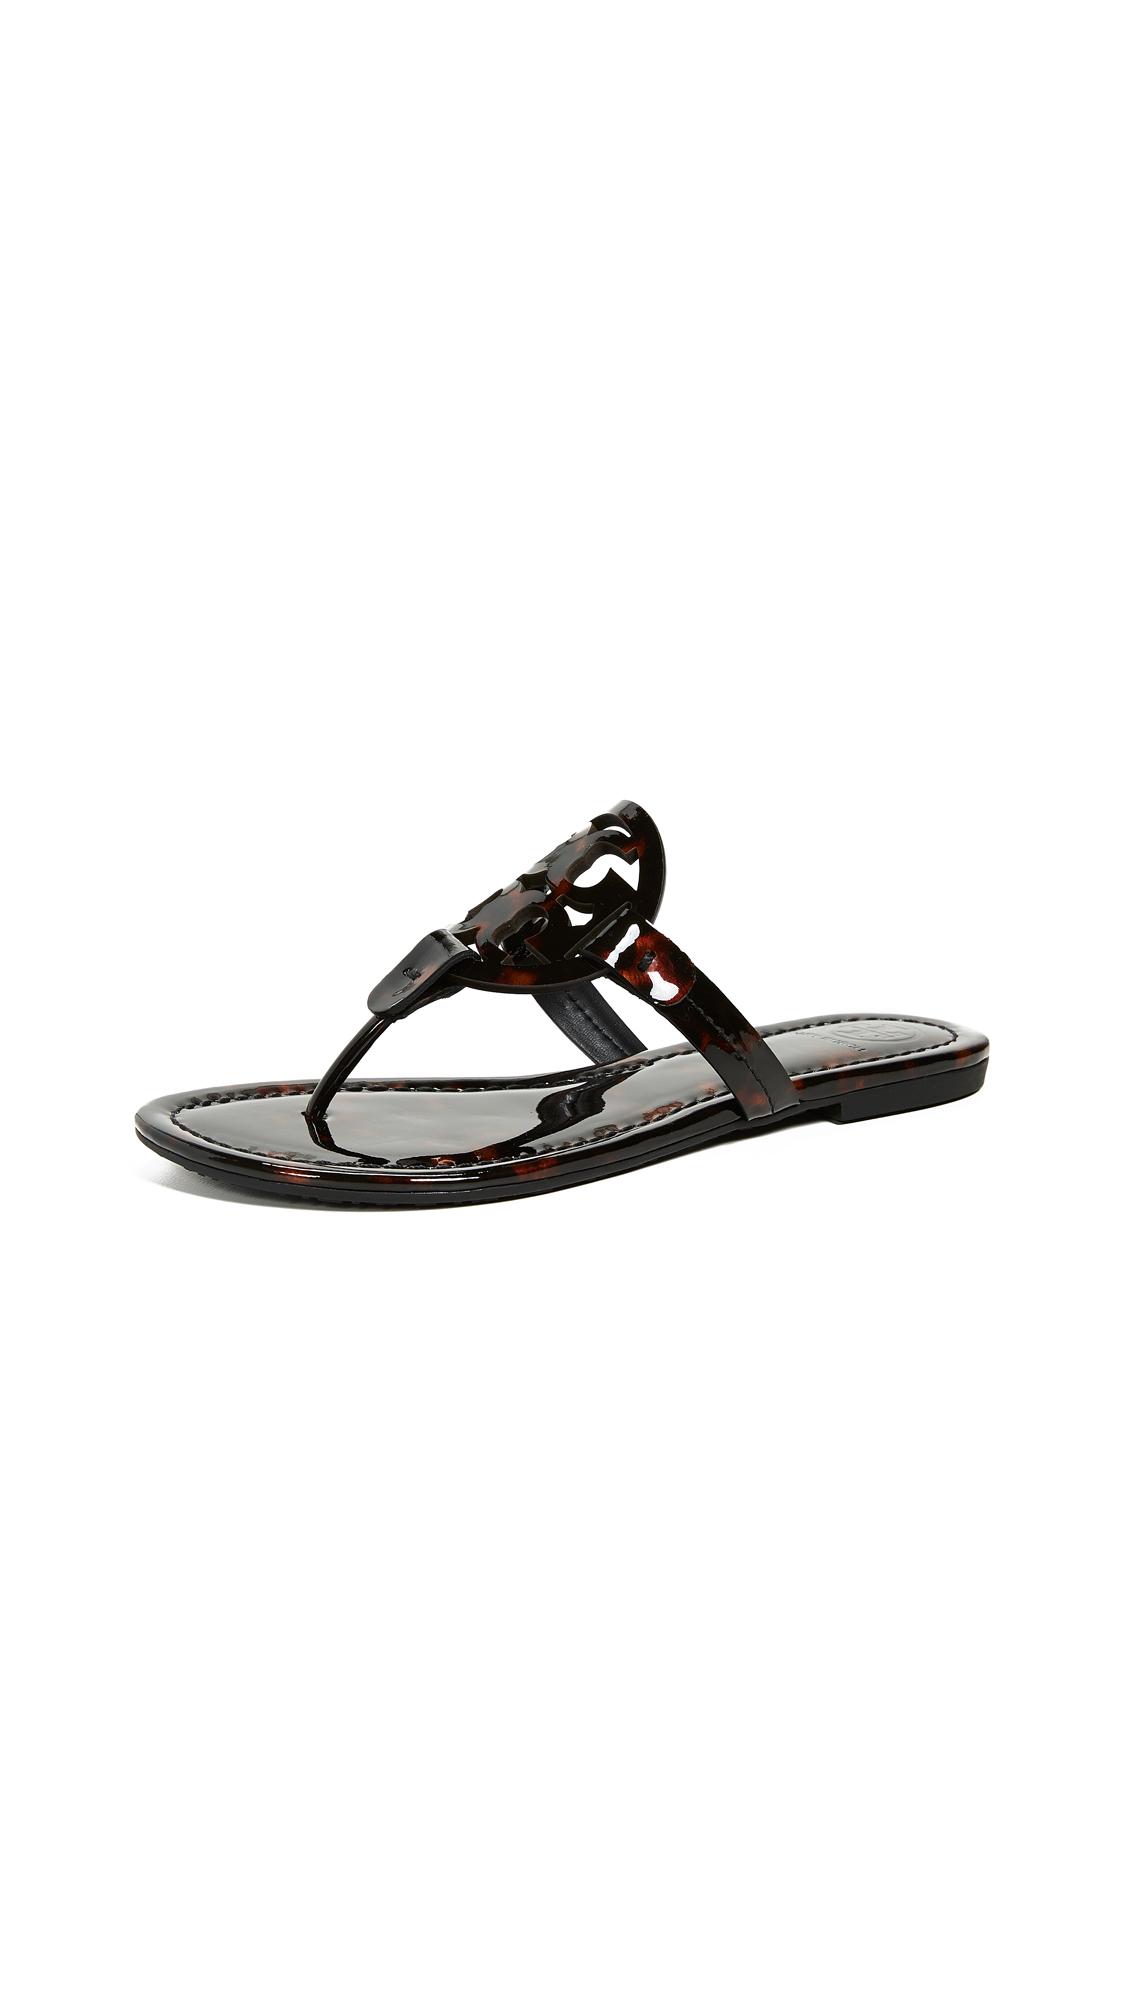 Tory Burch Miller Thong Sandals - Tortoise